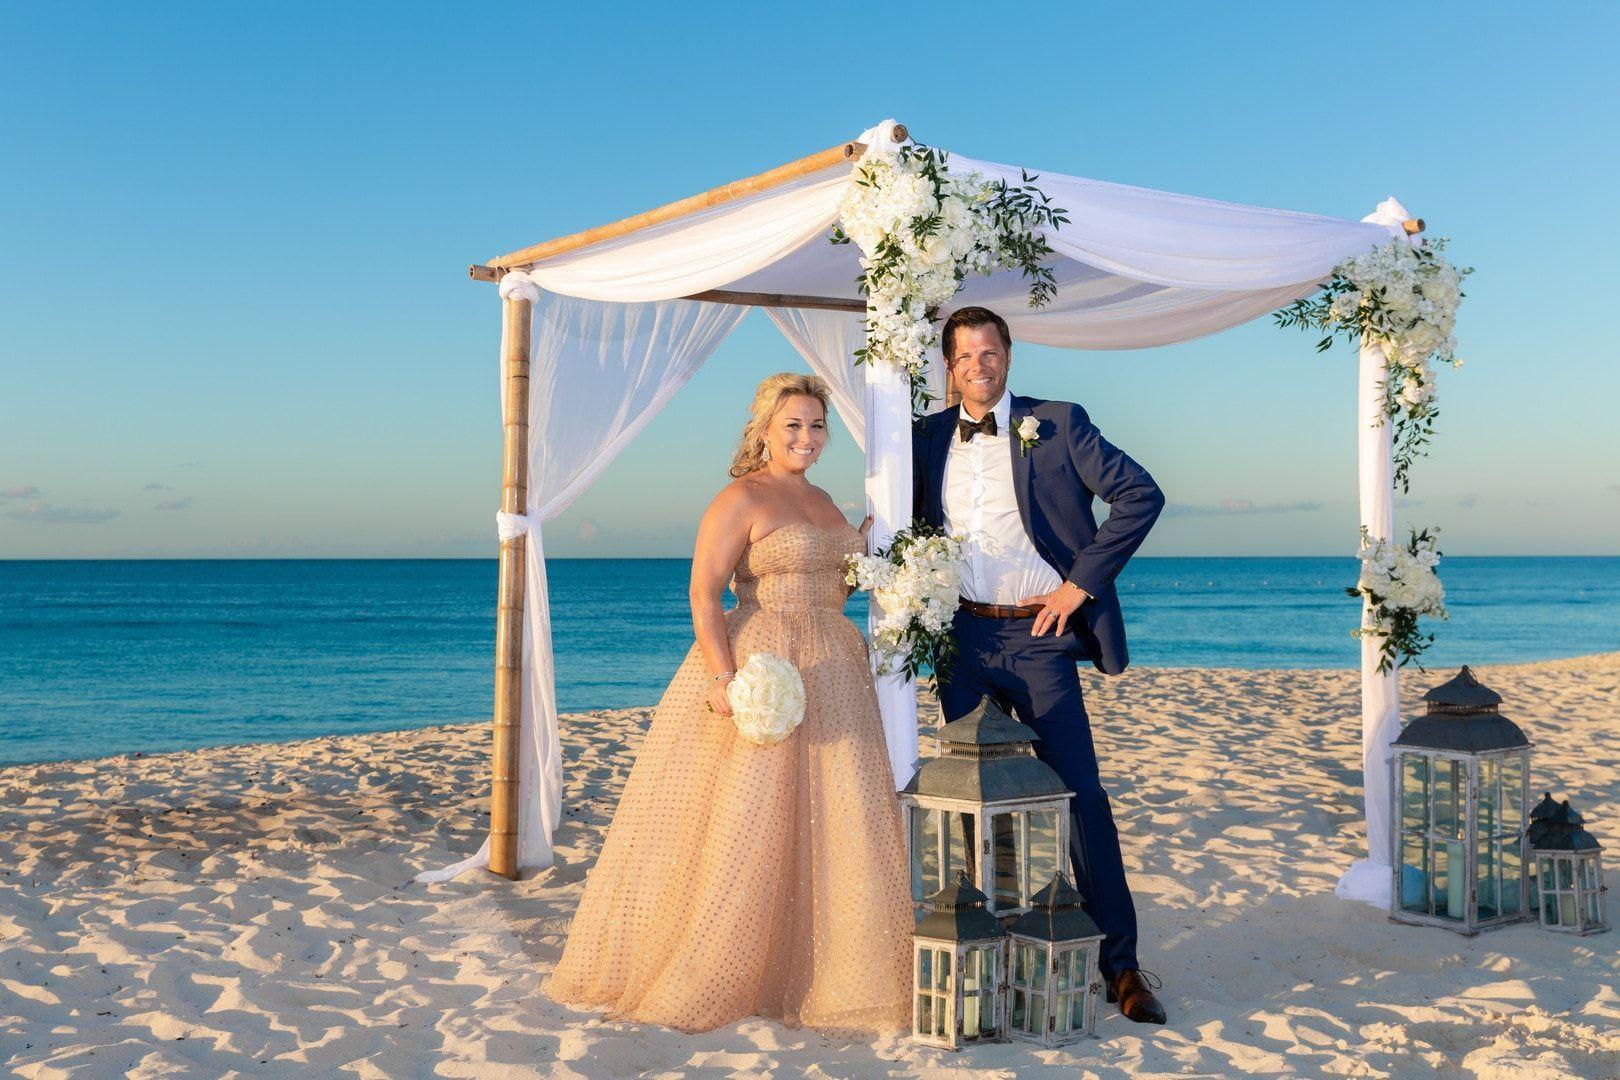 Grace Bay Turks And Caicos Destination Wedding Glittery Bride Destination Wedding Turks And Caicos Wedding Monochrome Weddings